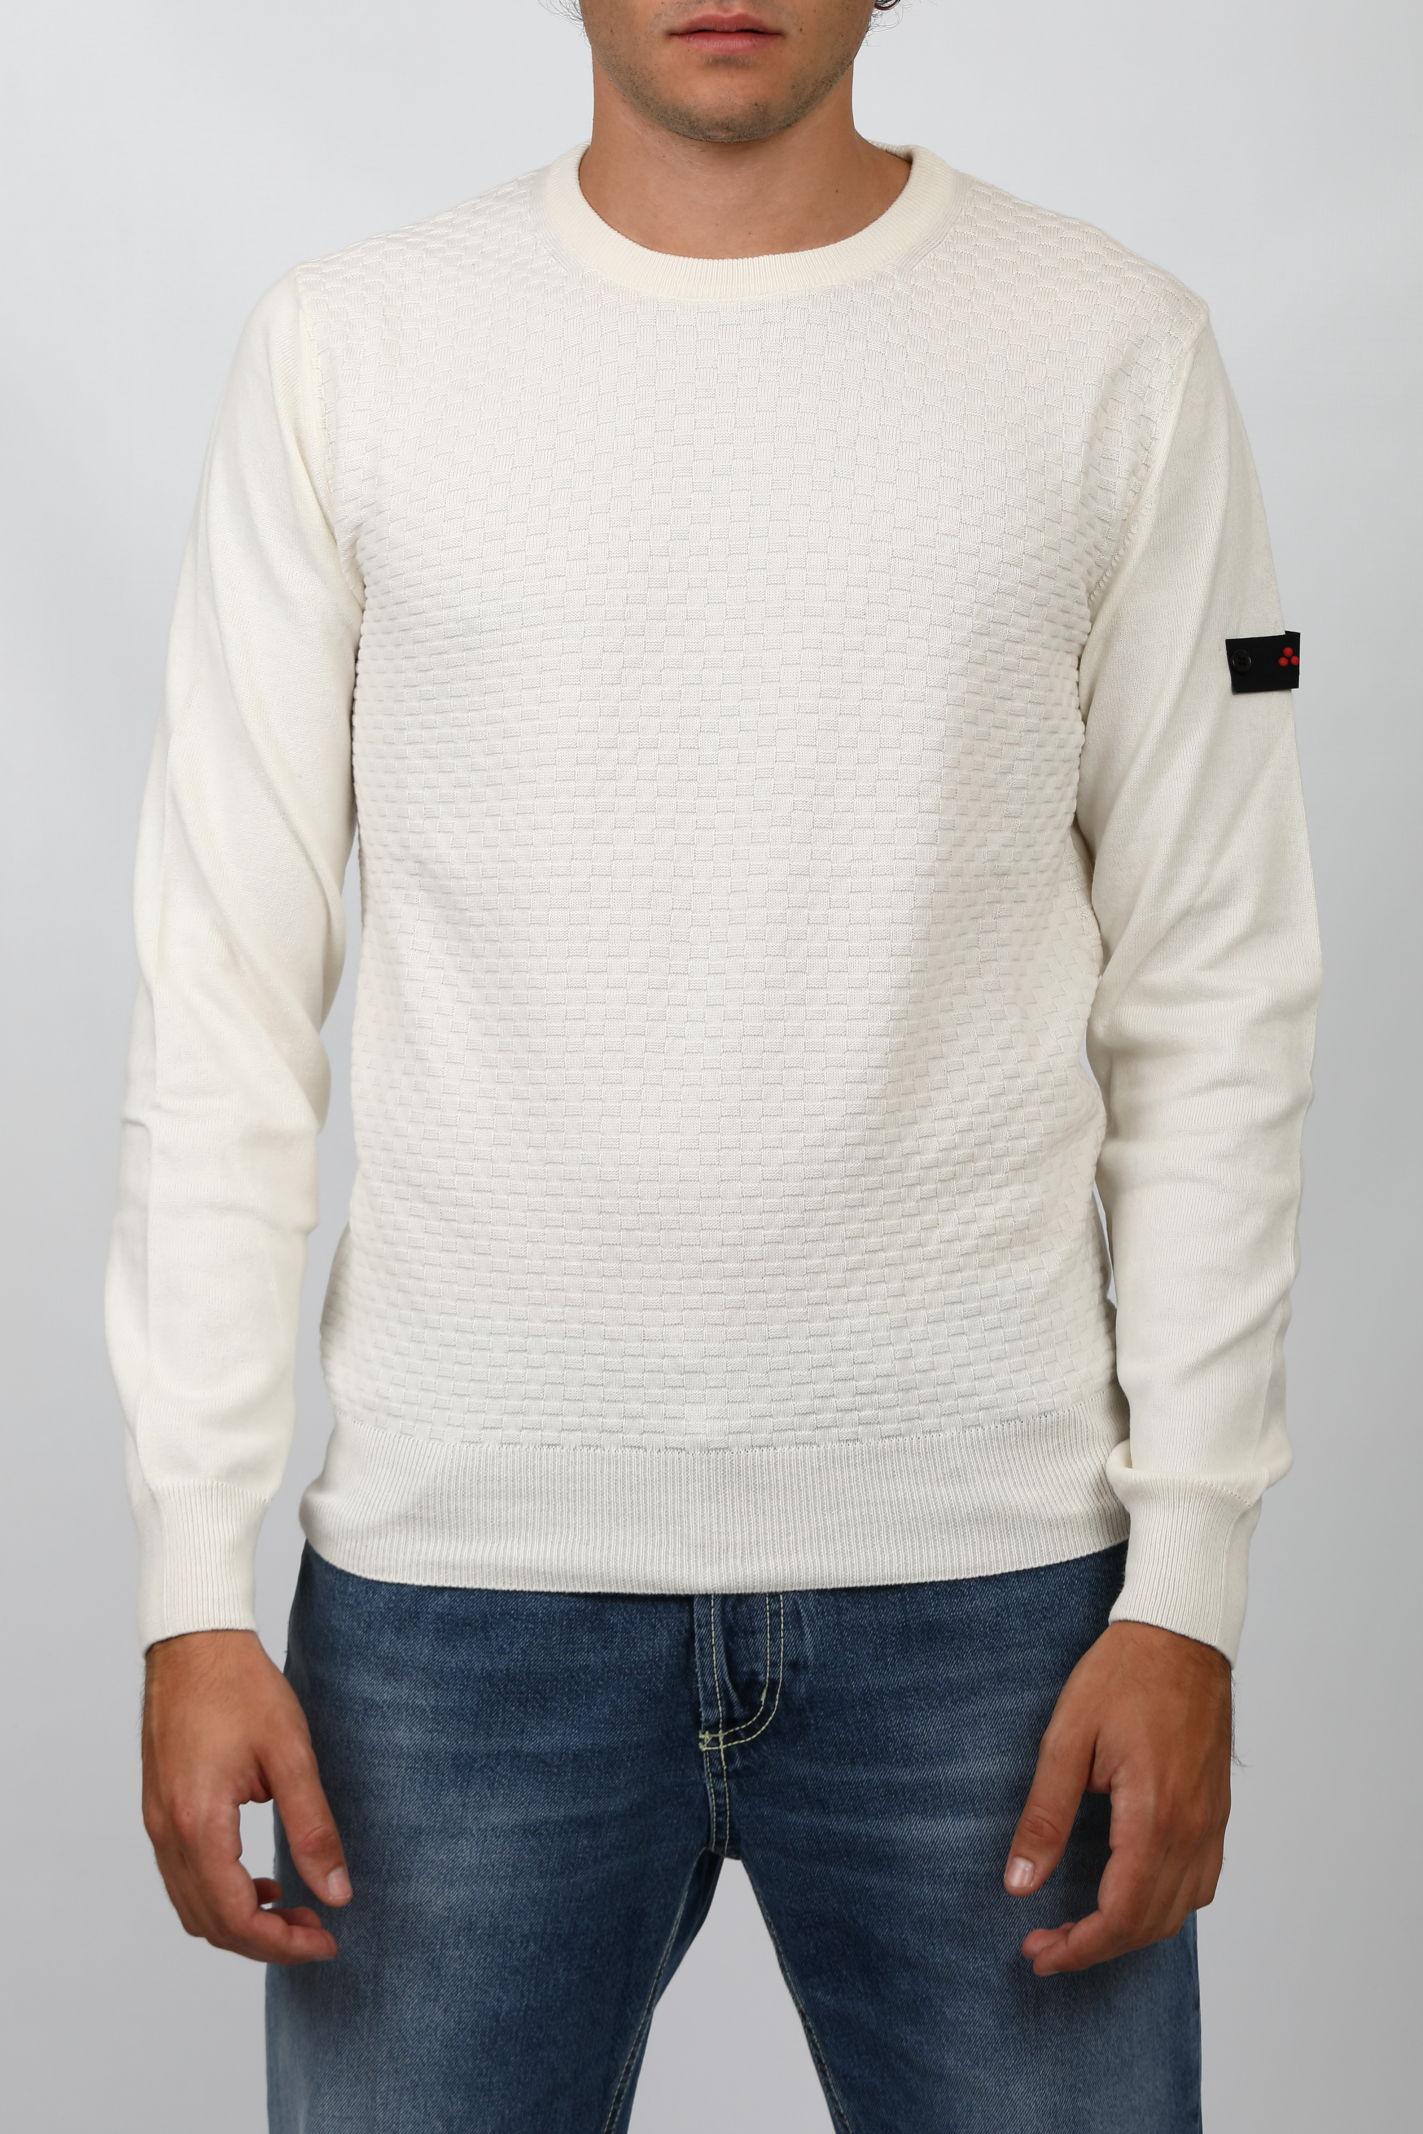 SHIPKA PEUTEREY   Knitwear   PEU4094BIA